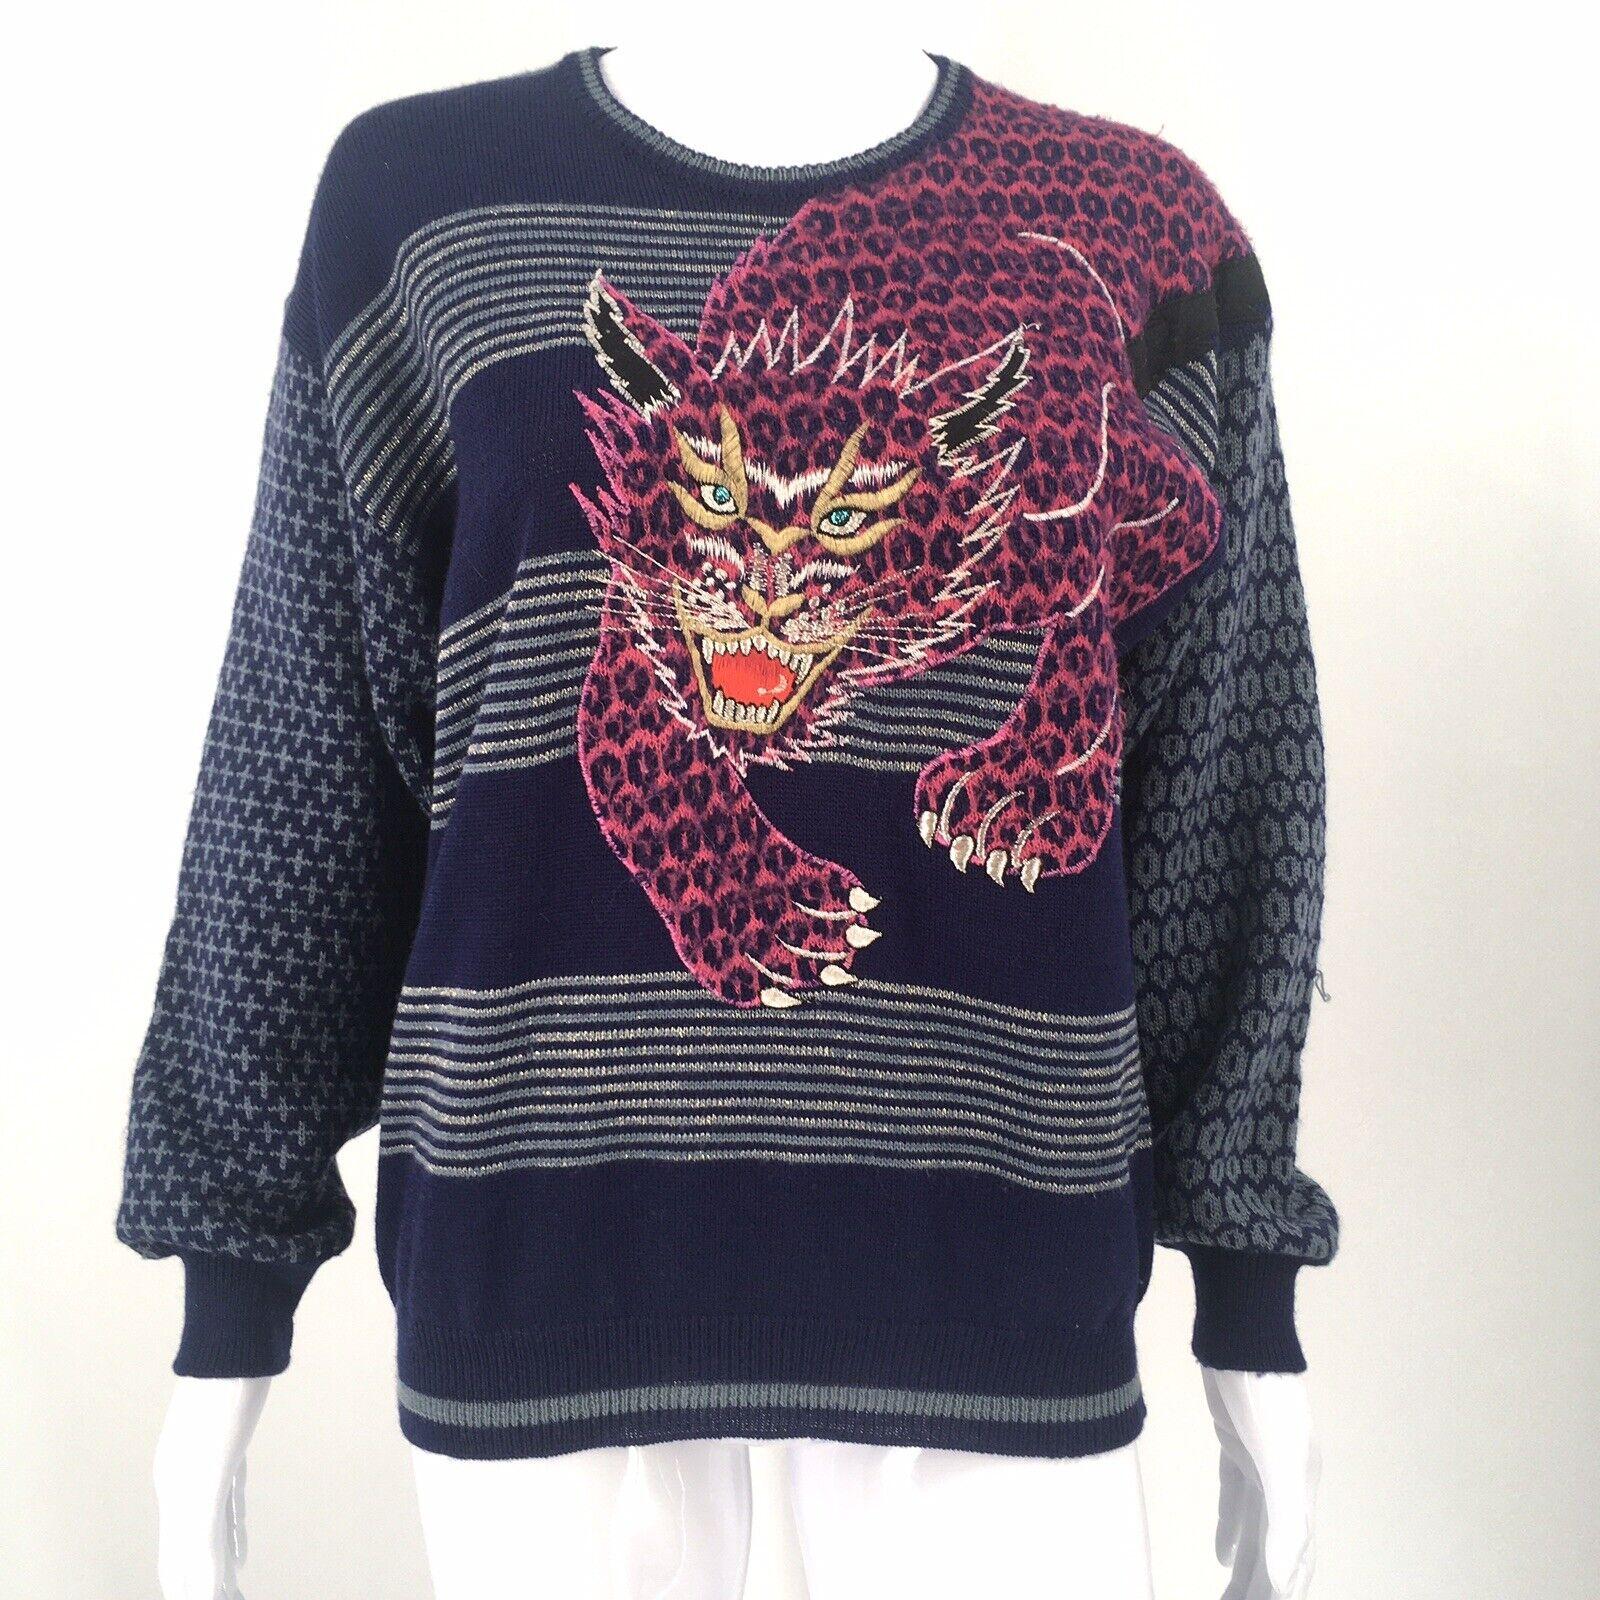 Kansai Yamamoto Vintage Sweater  - image 1